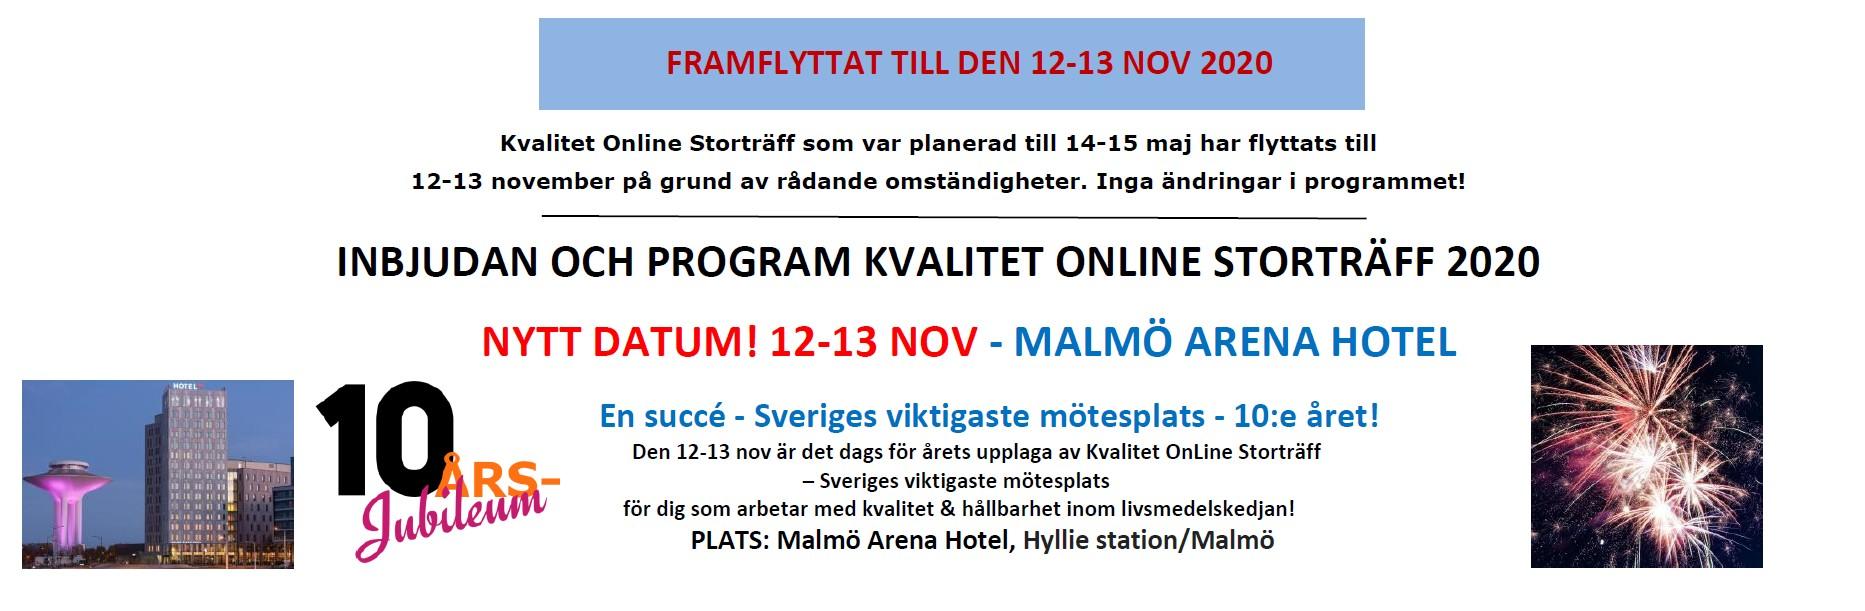 Kvalitet OnLine Storträff 12-13 nov 2020 - 10-årsjubileum! 1